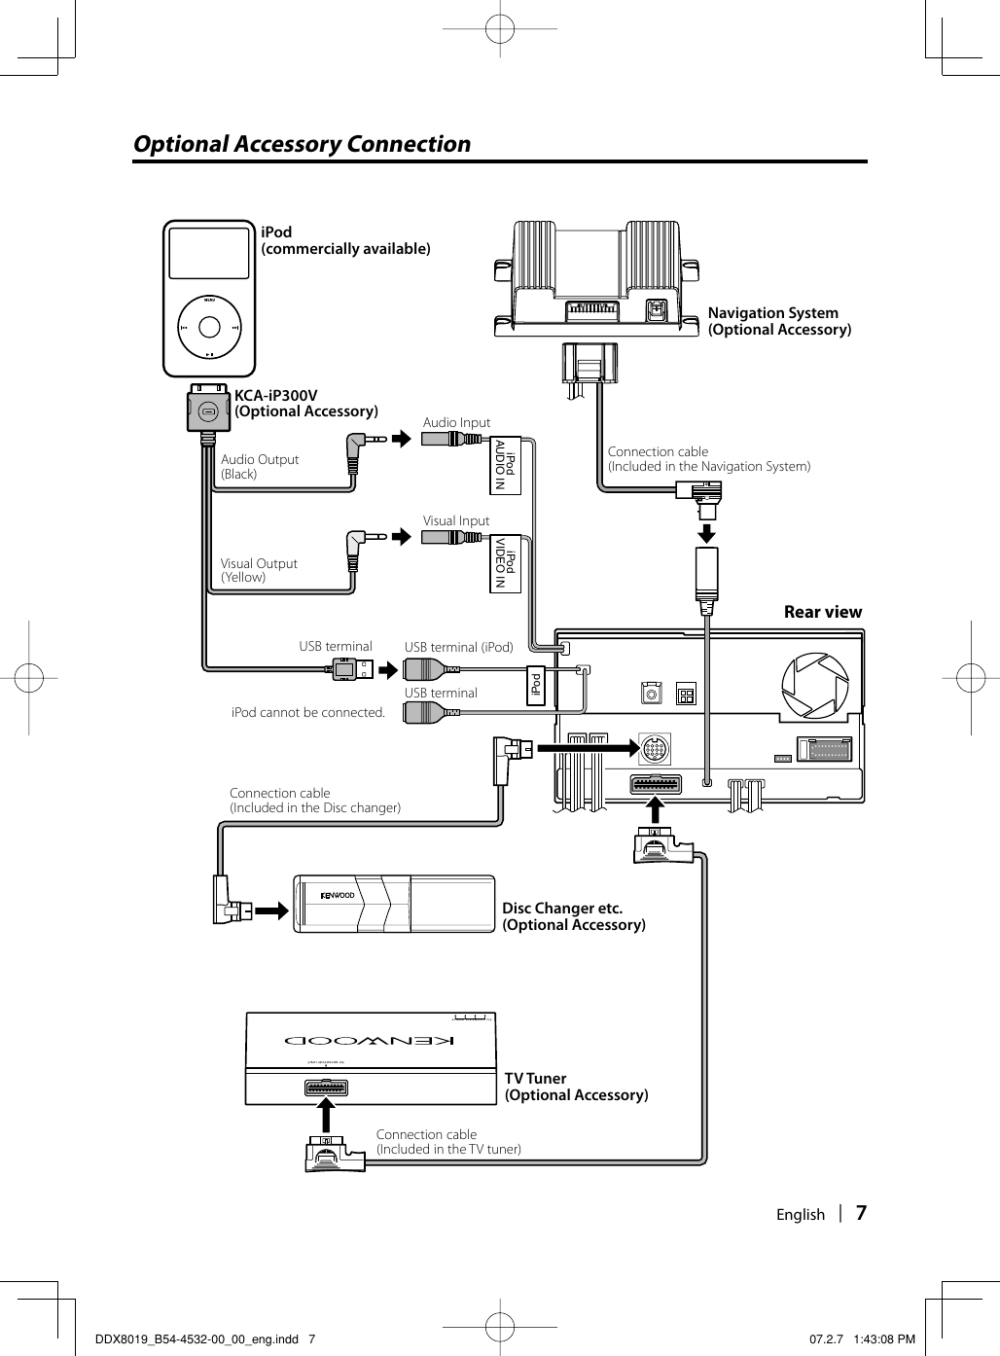 medium resolution of page 7 of 12 kenwood kenwood excelon ddx8019 users manual